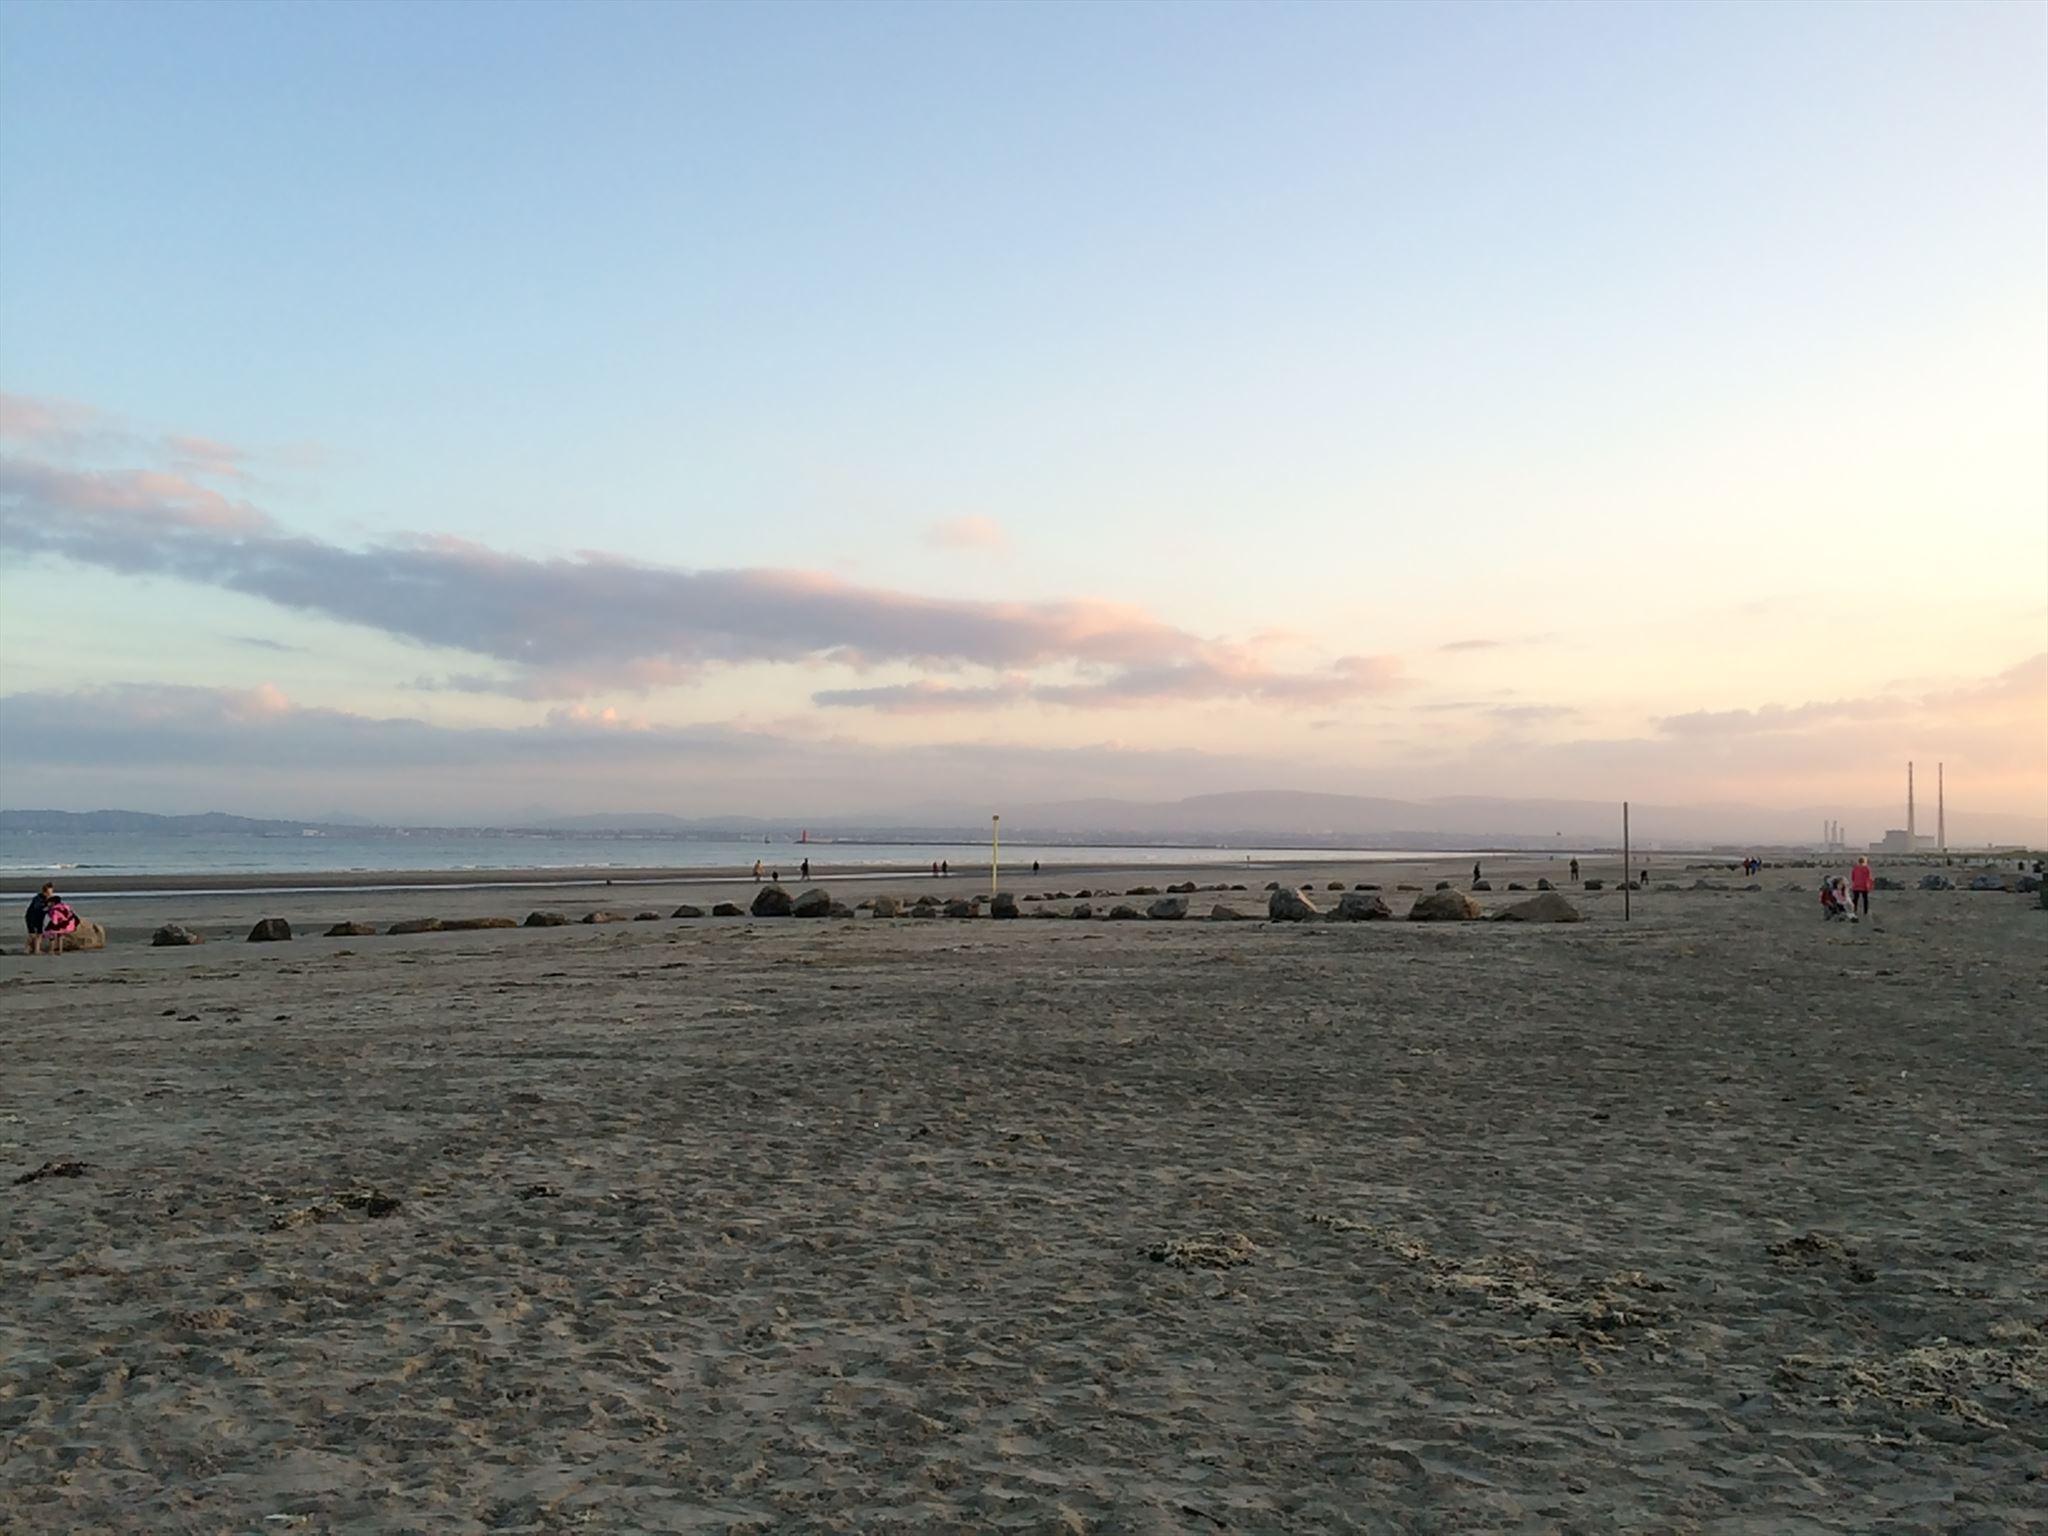 North Bull Island earthcache